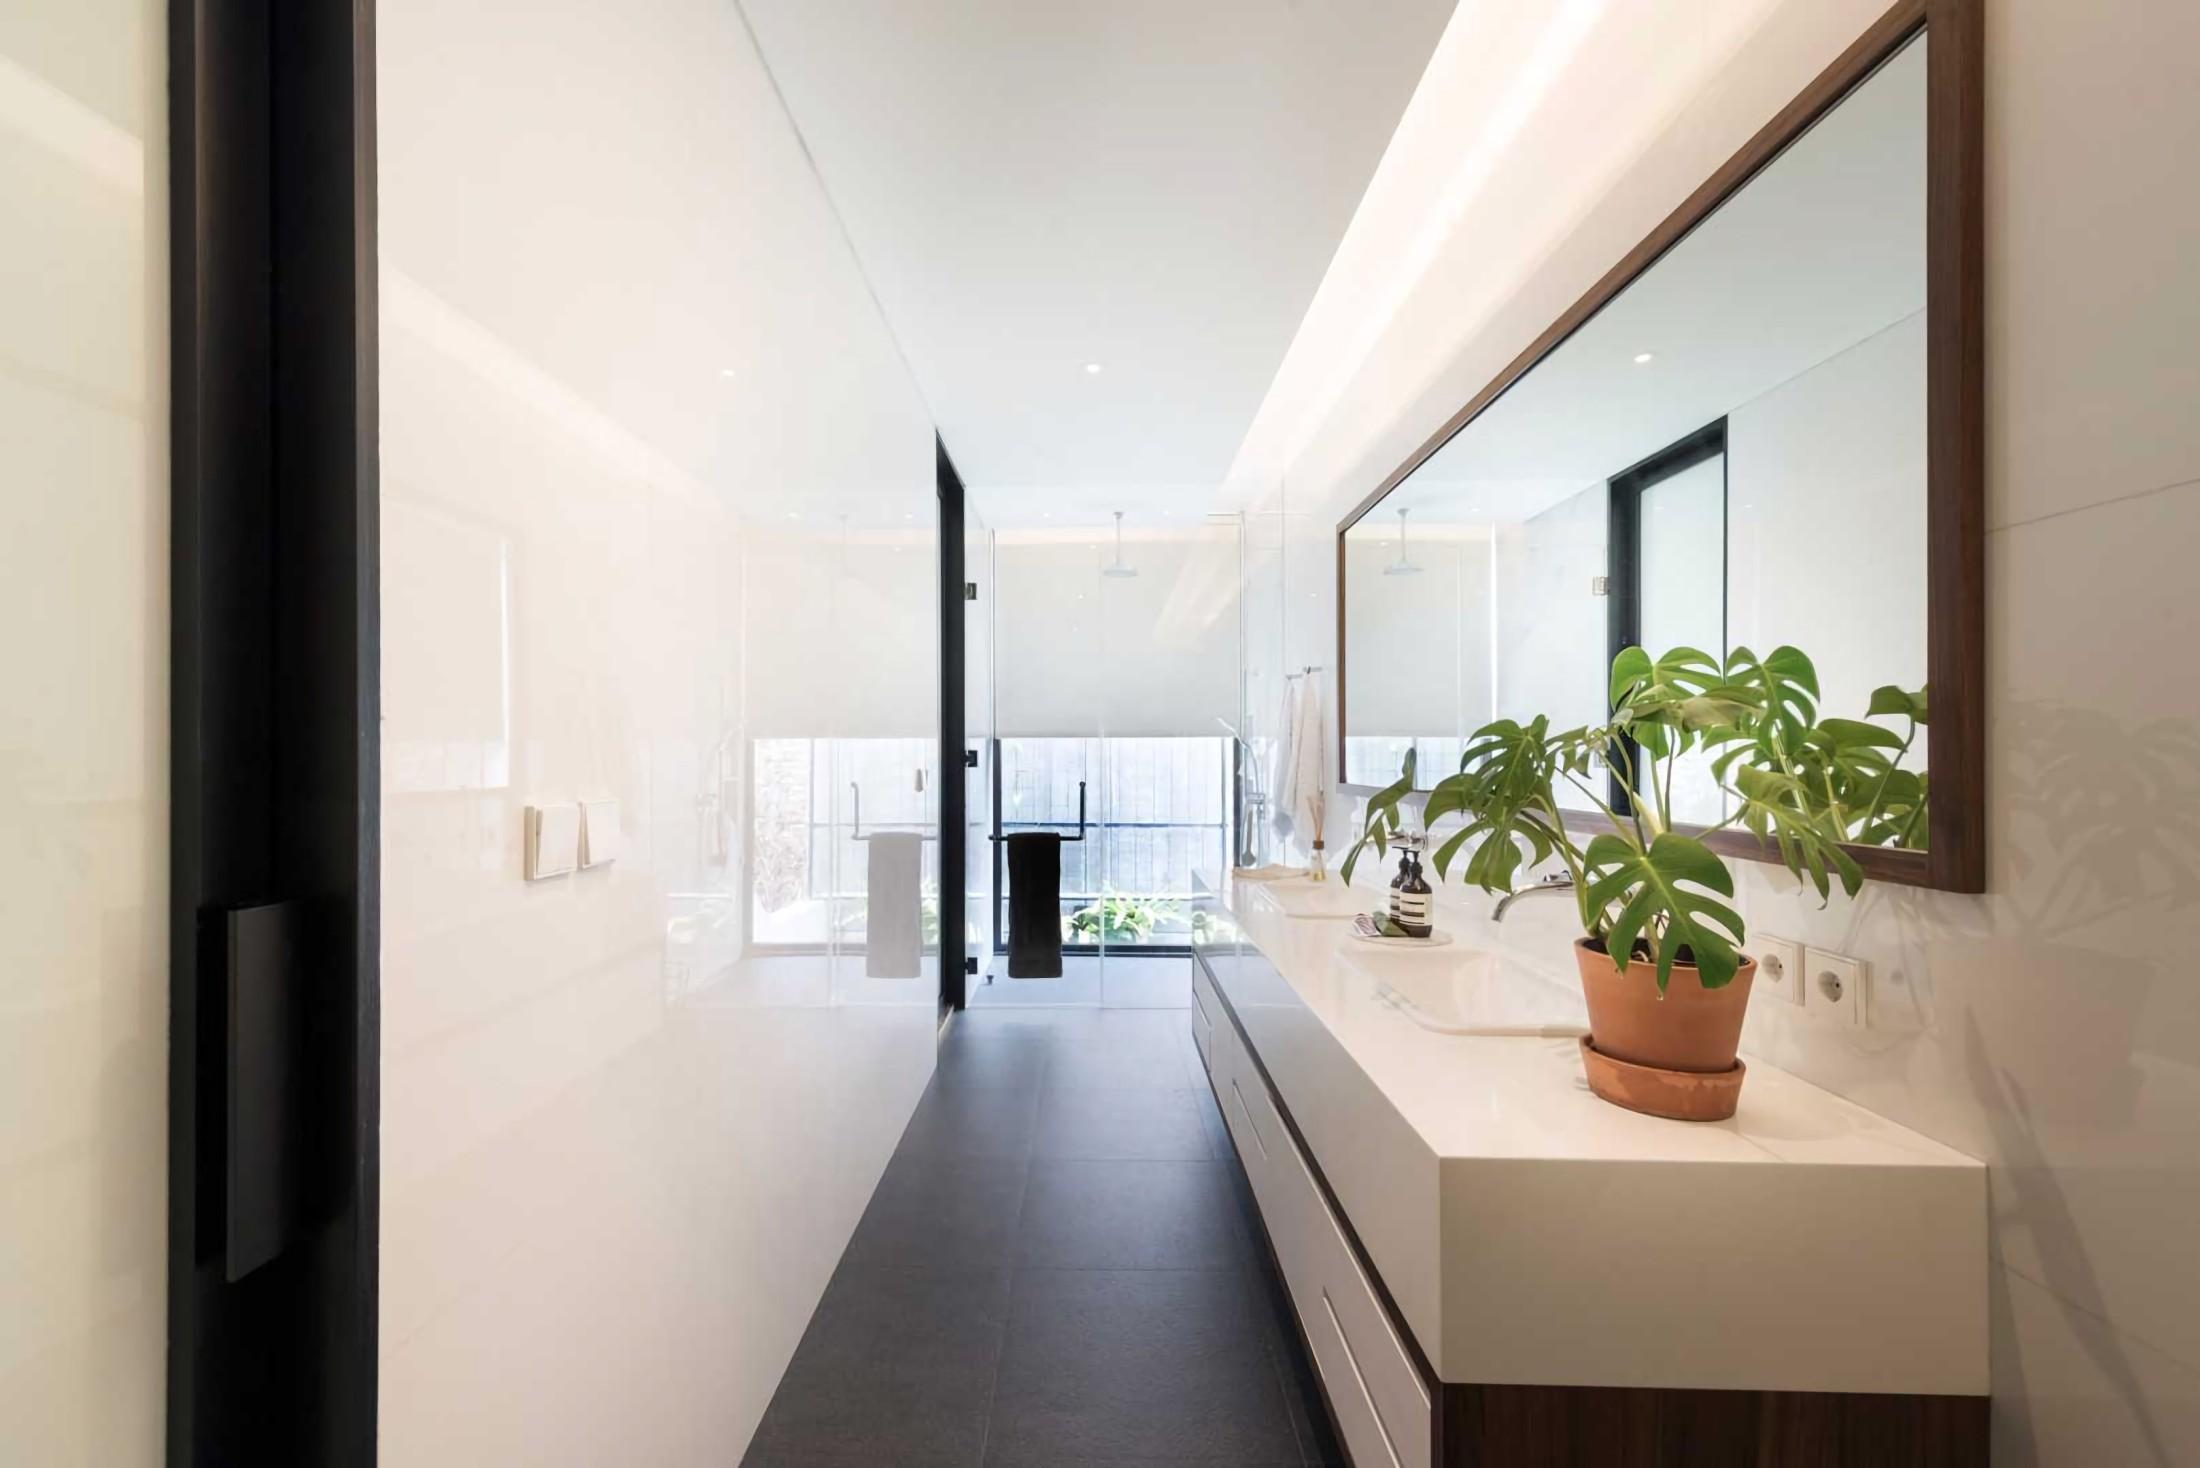 Efek pantulan membuat kamar mandi terkesan lebih leluasa (Sumber: arsitag.com)